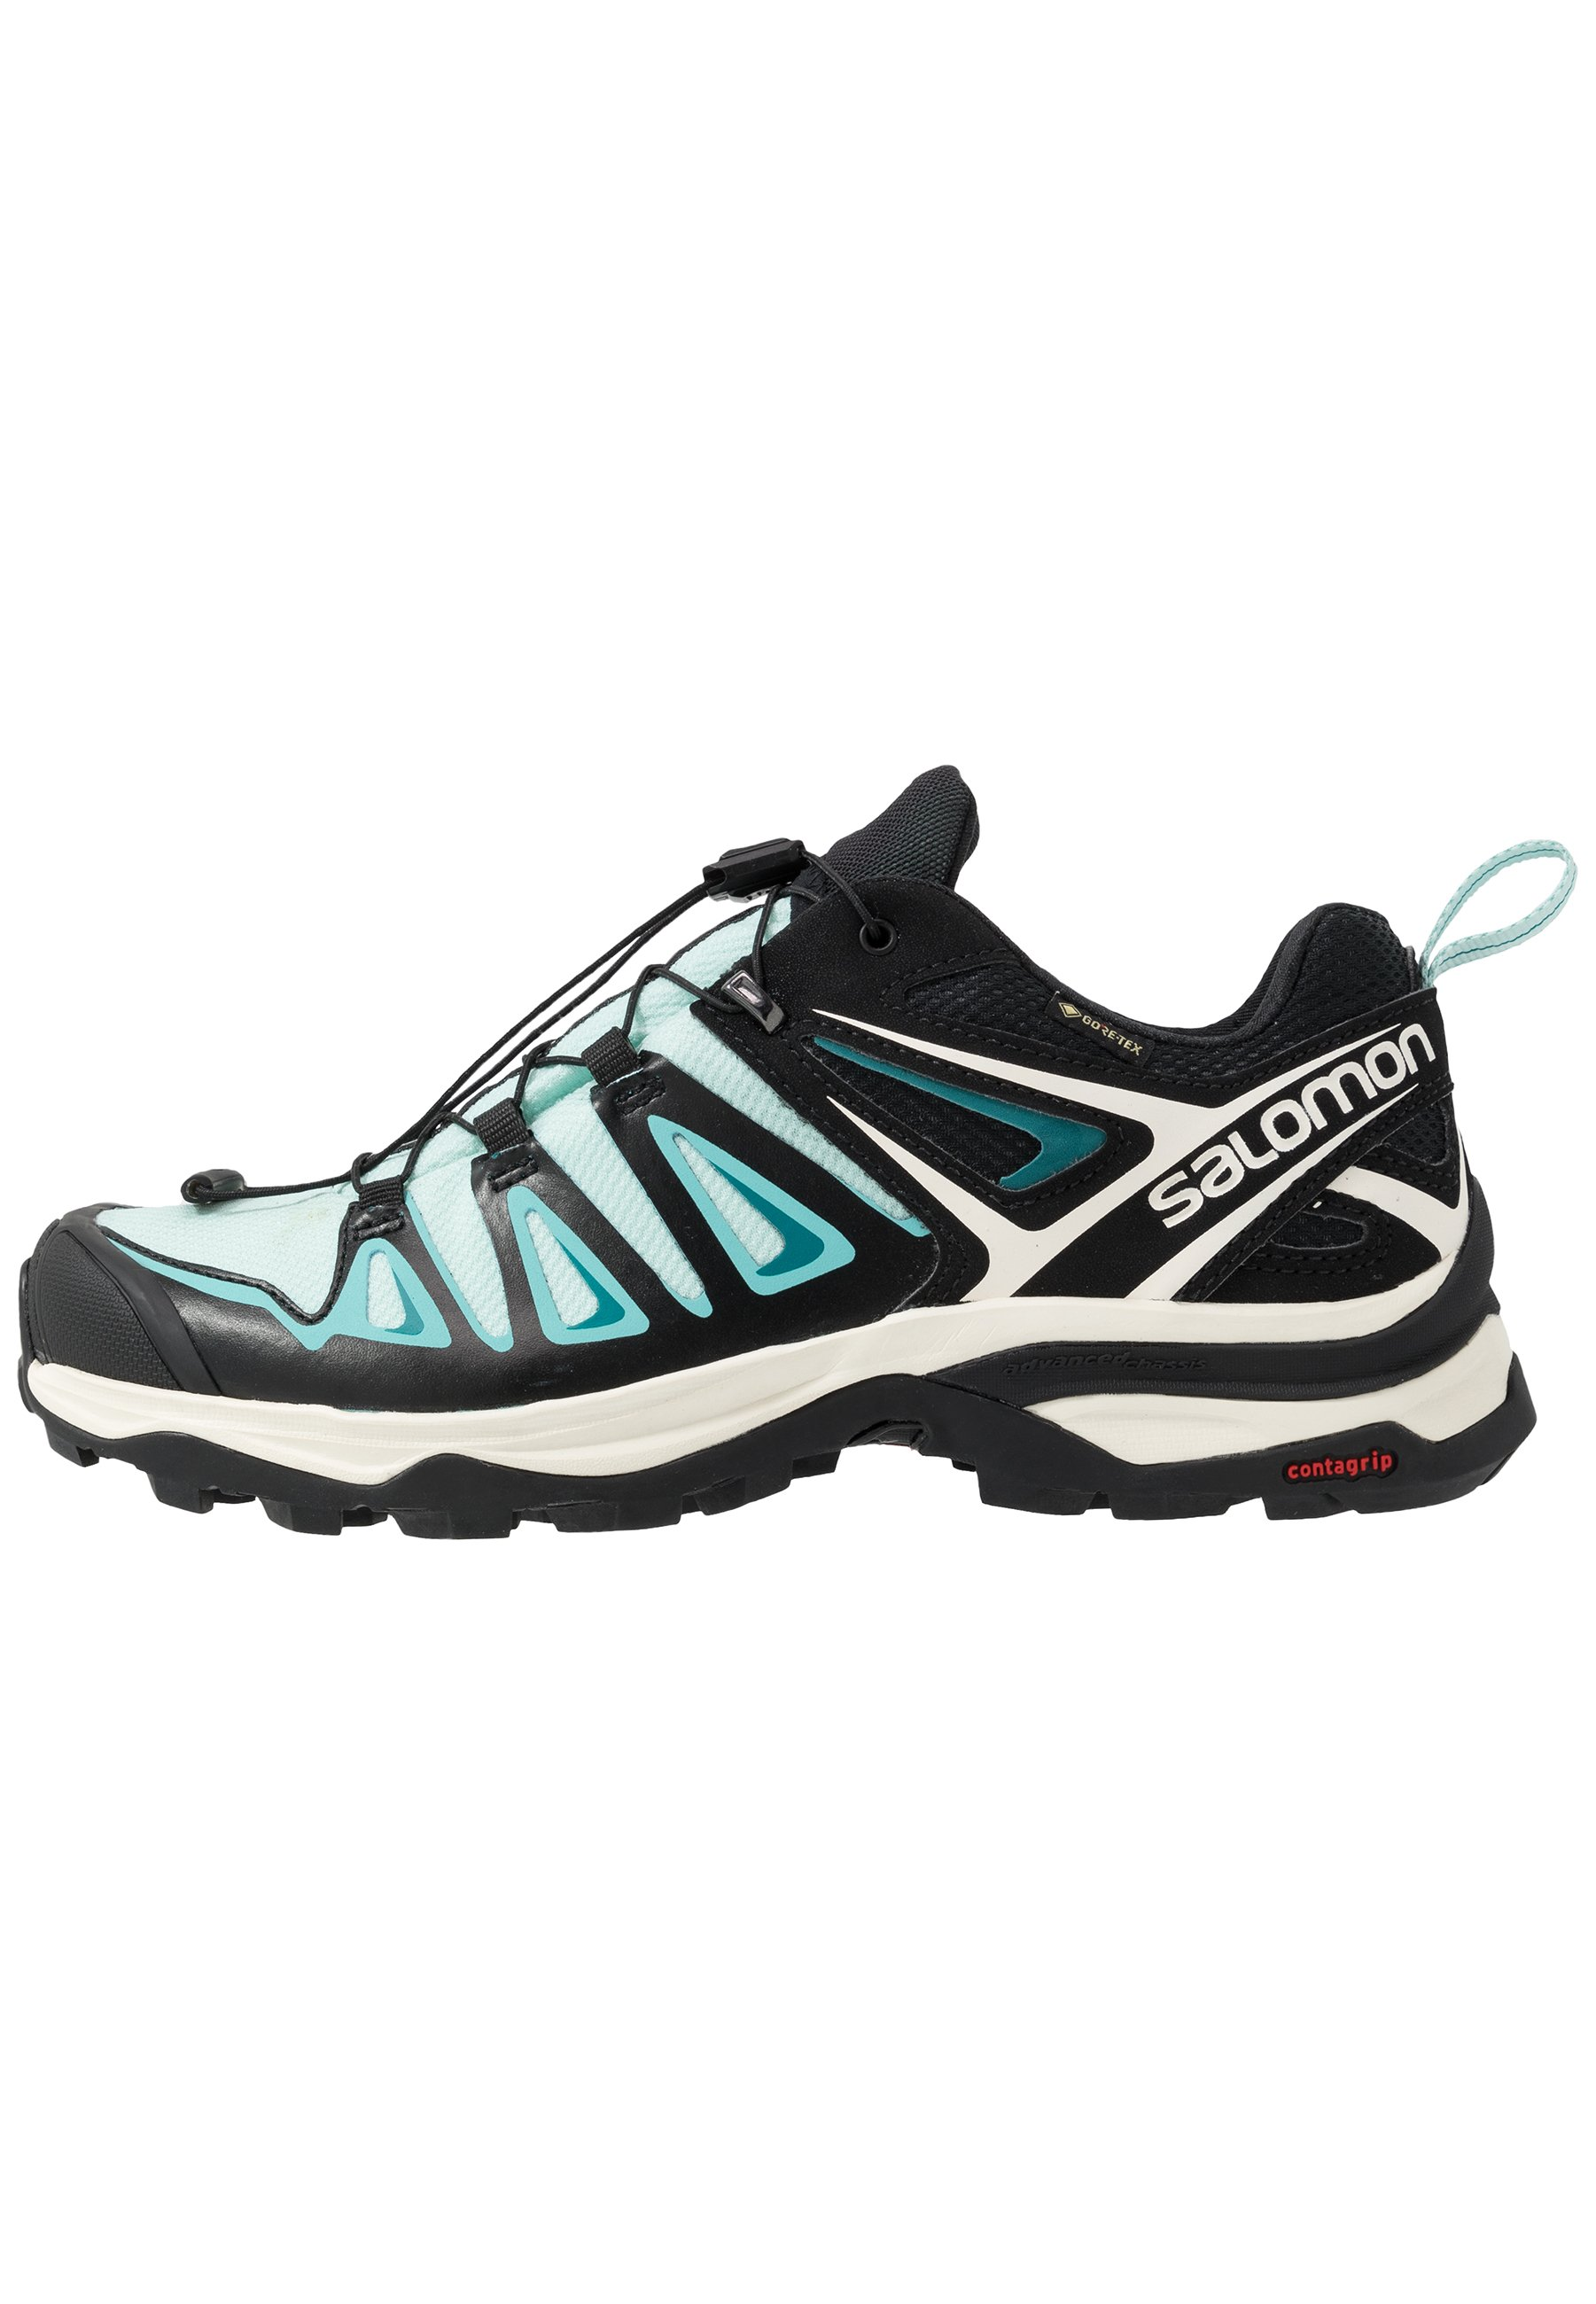 salomon zapatillas ultra trail gtx